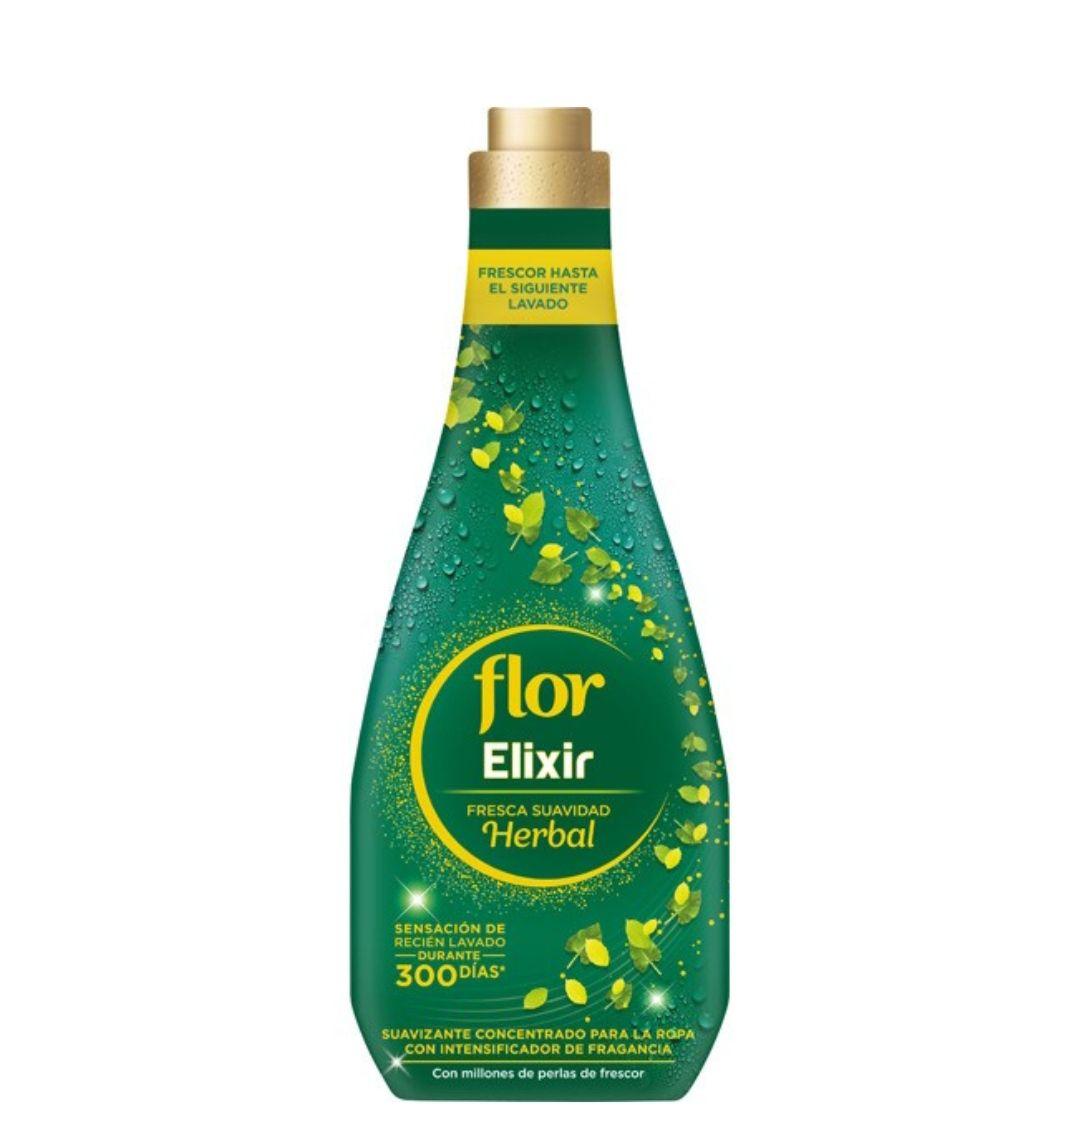 Flor elixir 50 lavados